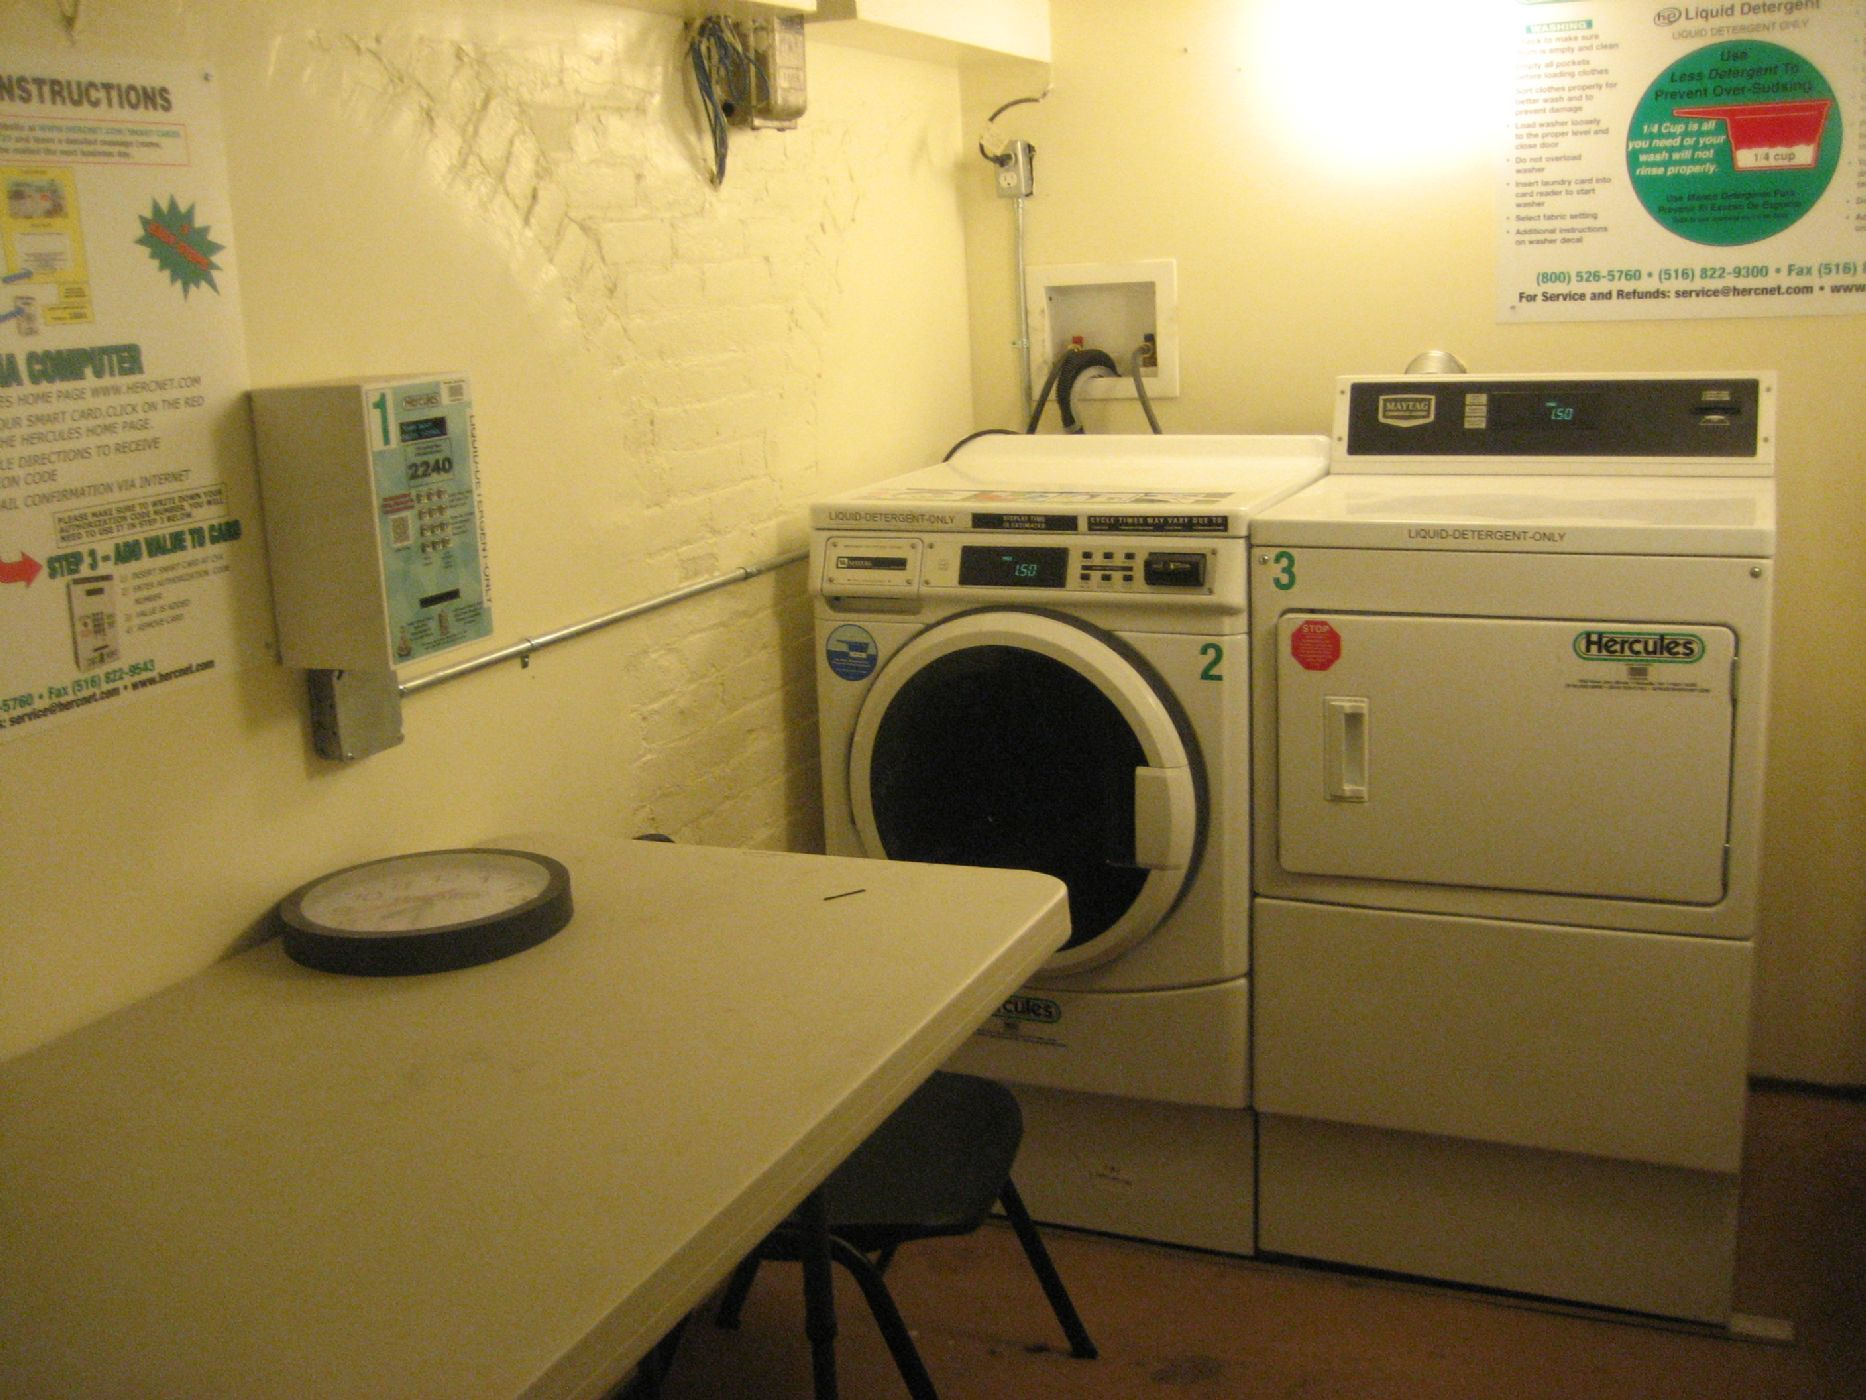 Hercules Laundry Card Refund | mamiihondenk org